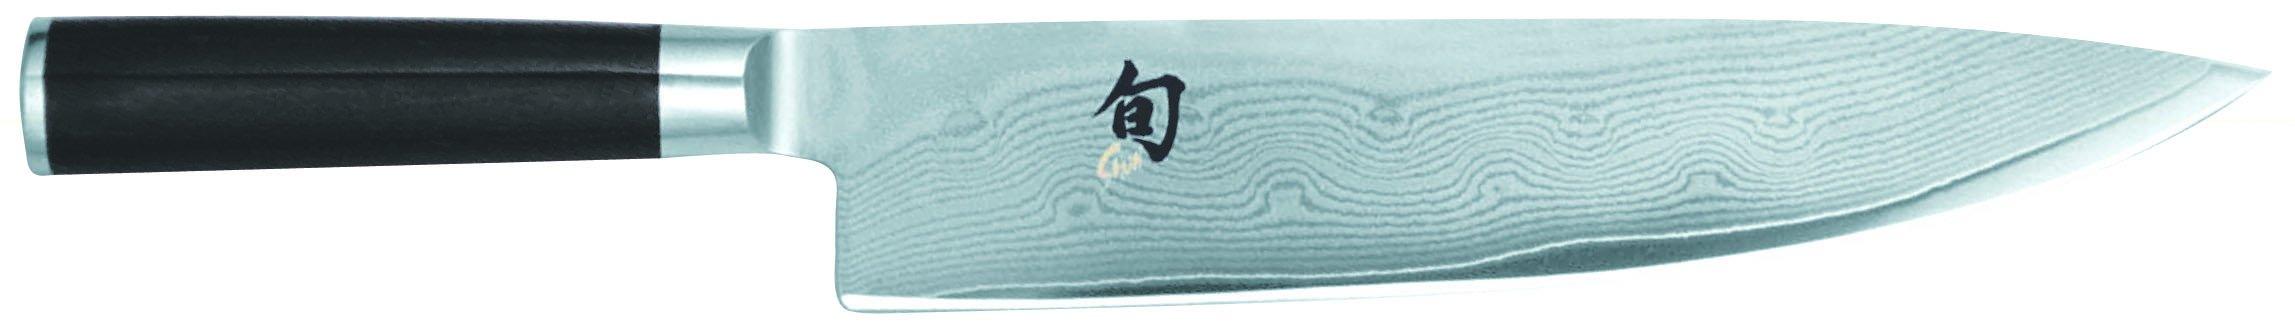 Shun DM0707 Classic 10-Inch Chef's Knife